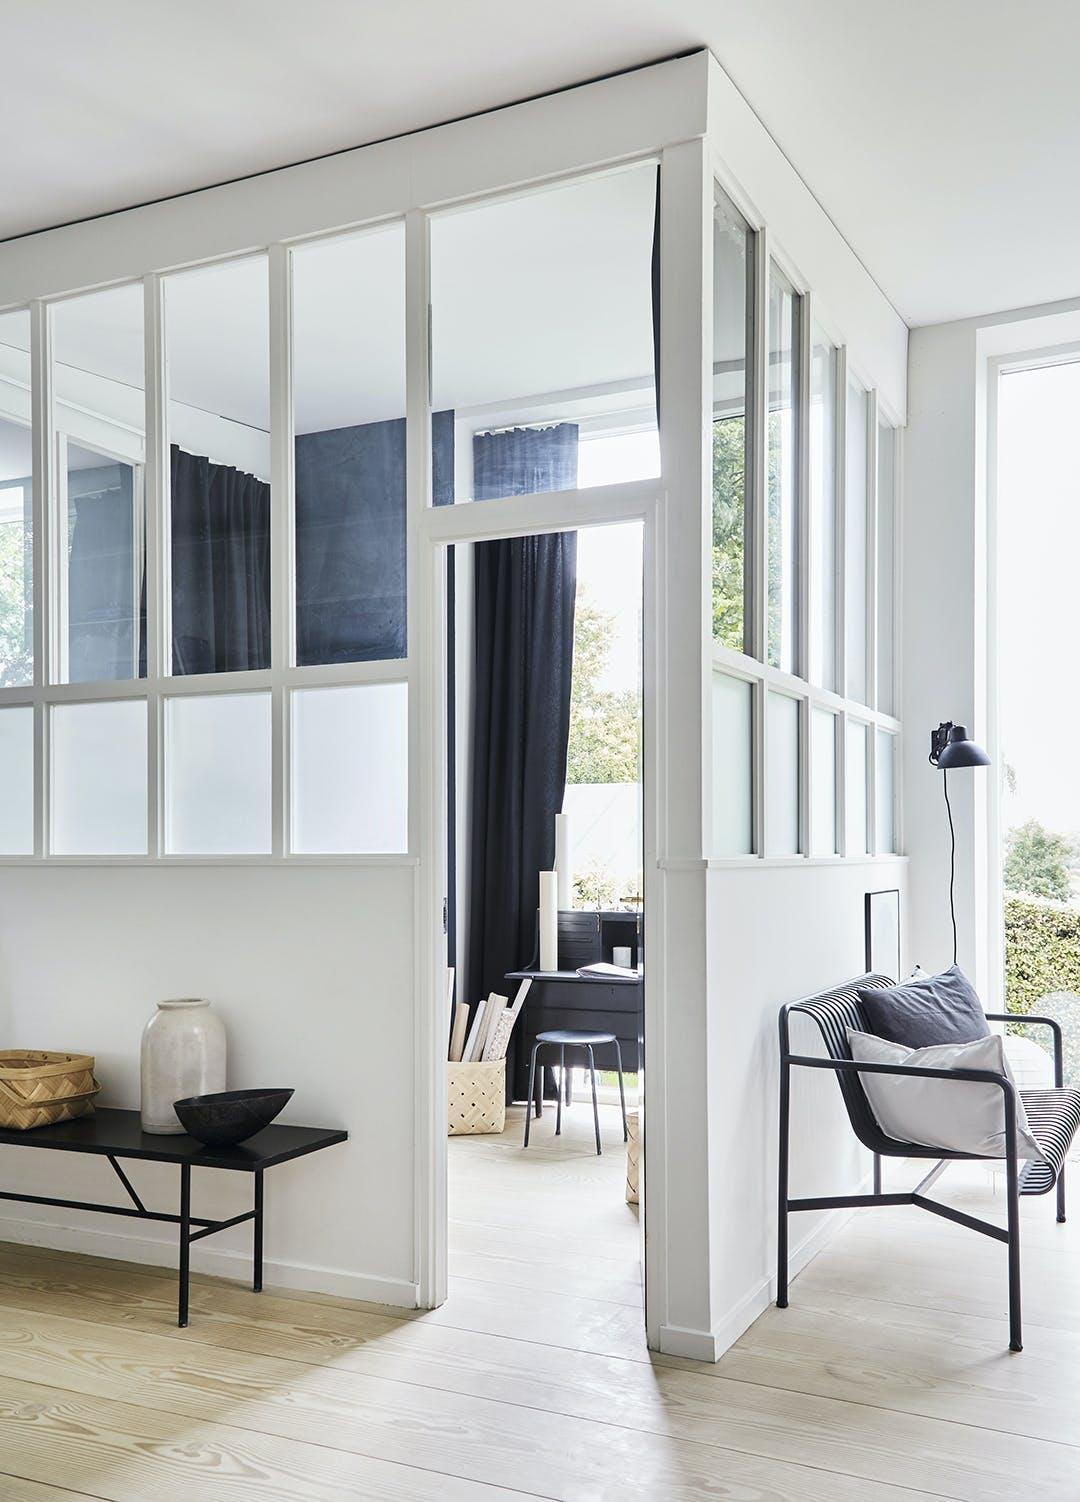 Glashus med vinduespartier